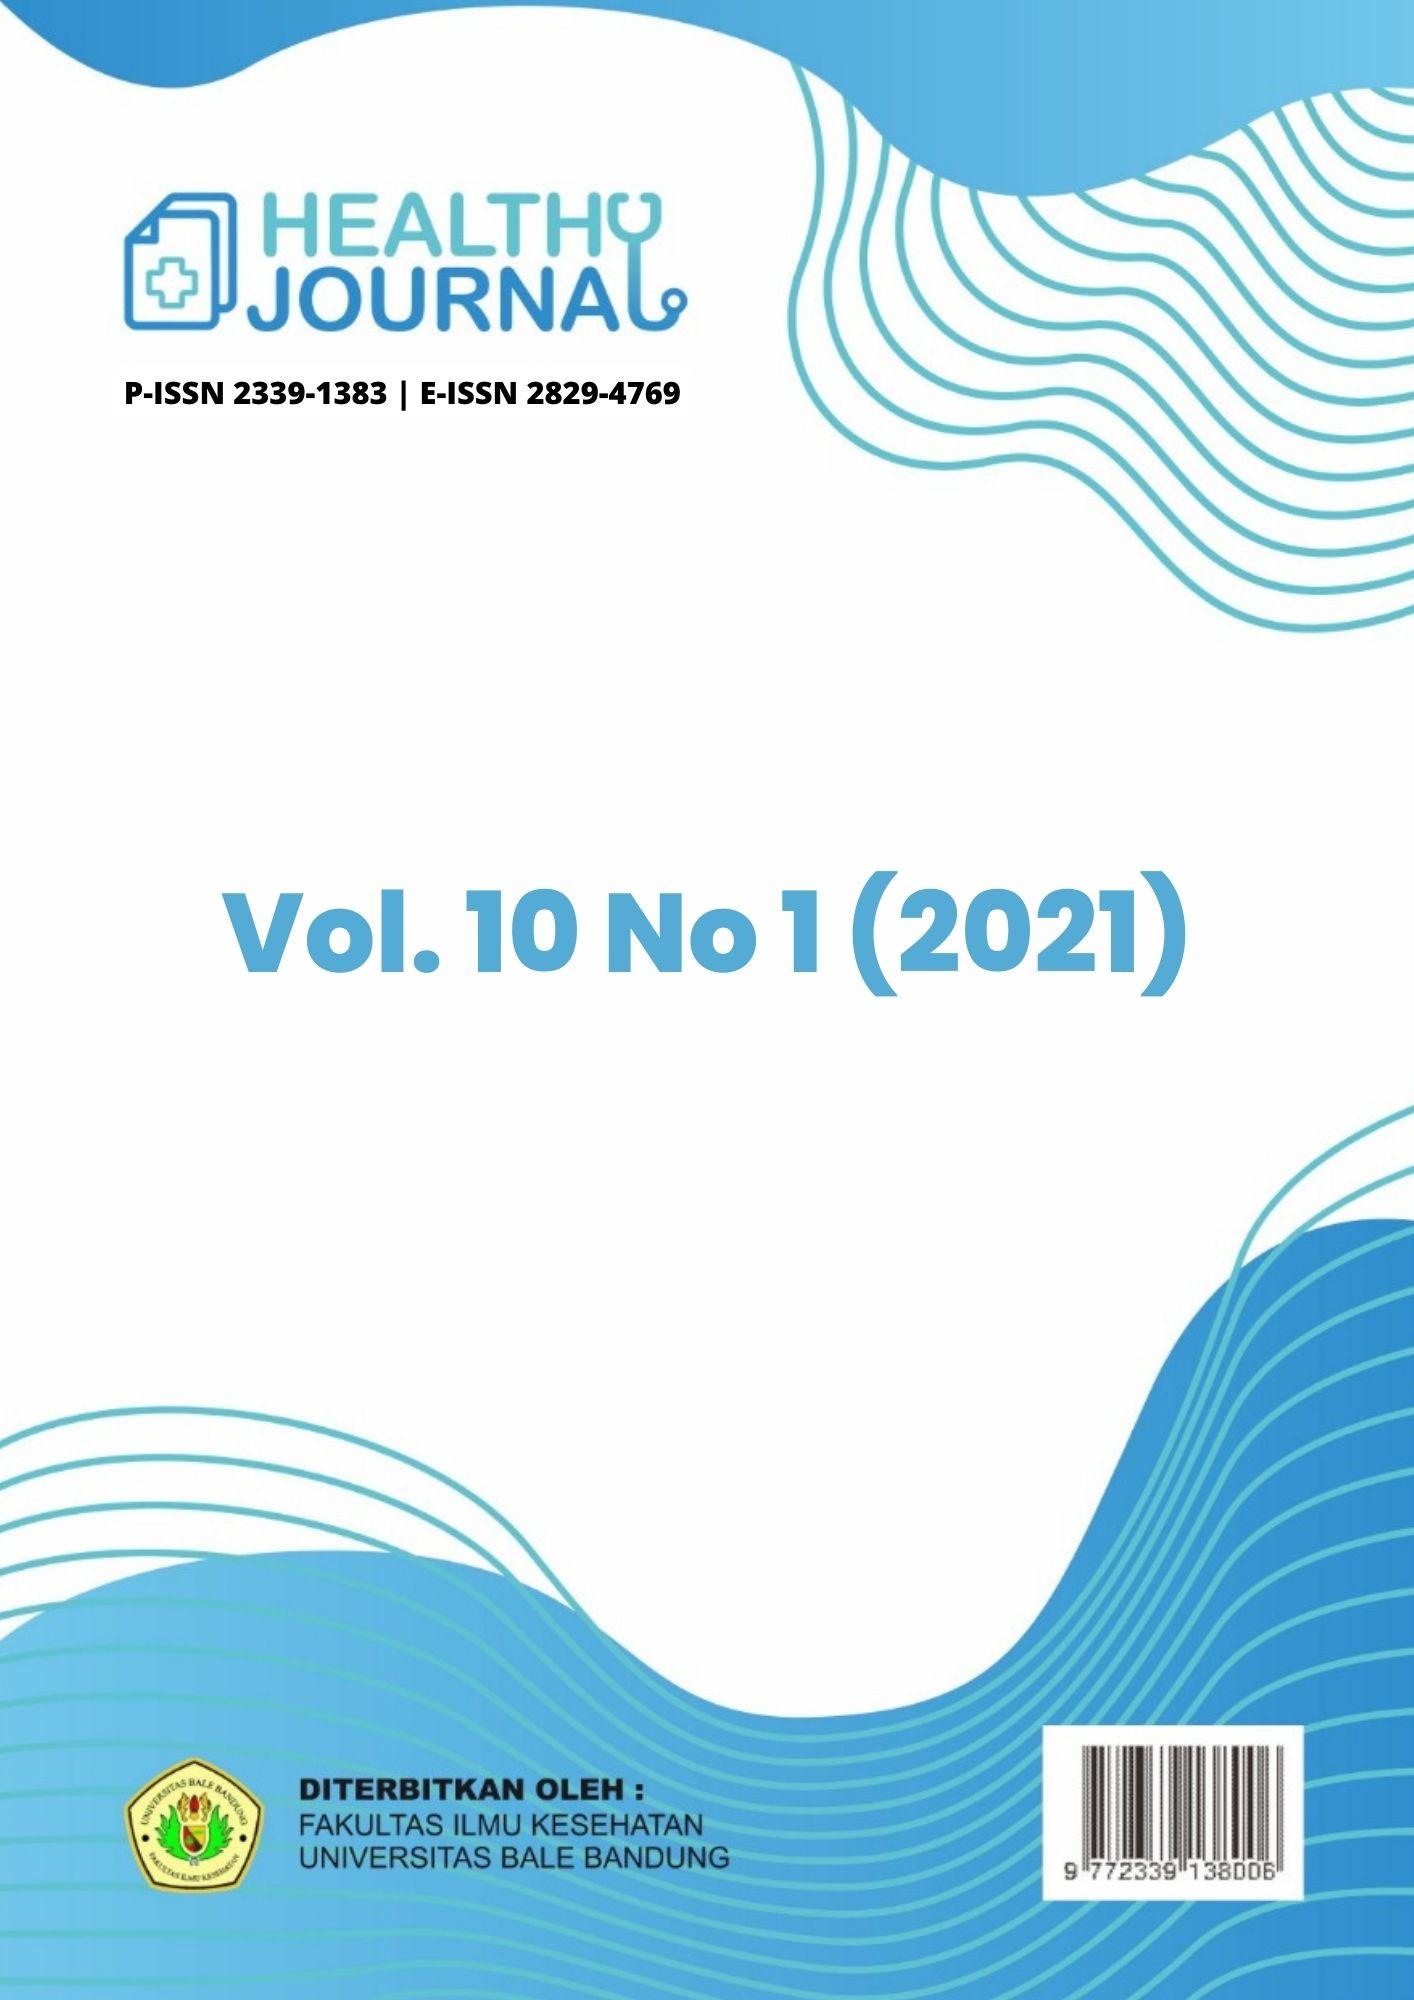 View Vol. 9 No. 1 (2021): HEALTHY JOURNAL | Jurnal Ilmiah Ilmu Kesehatan